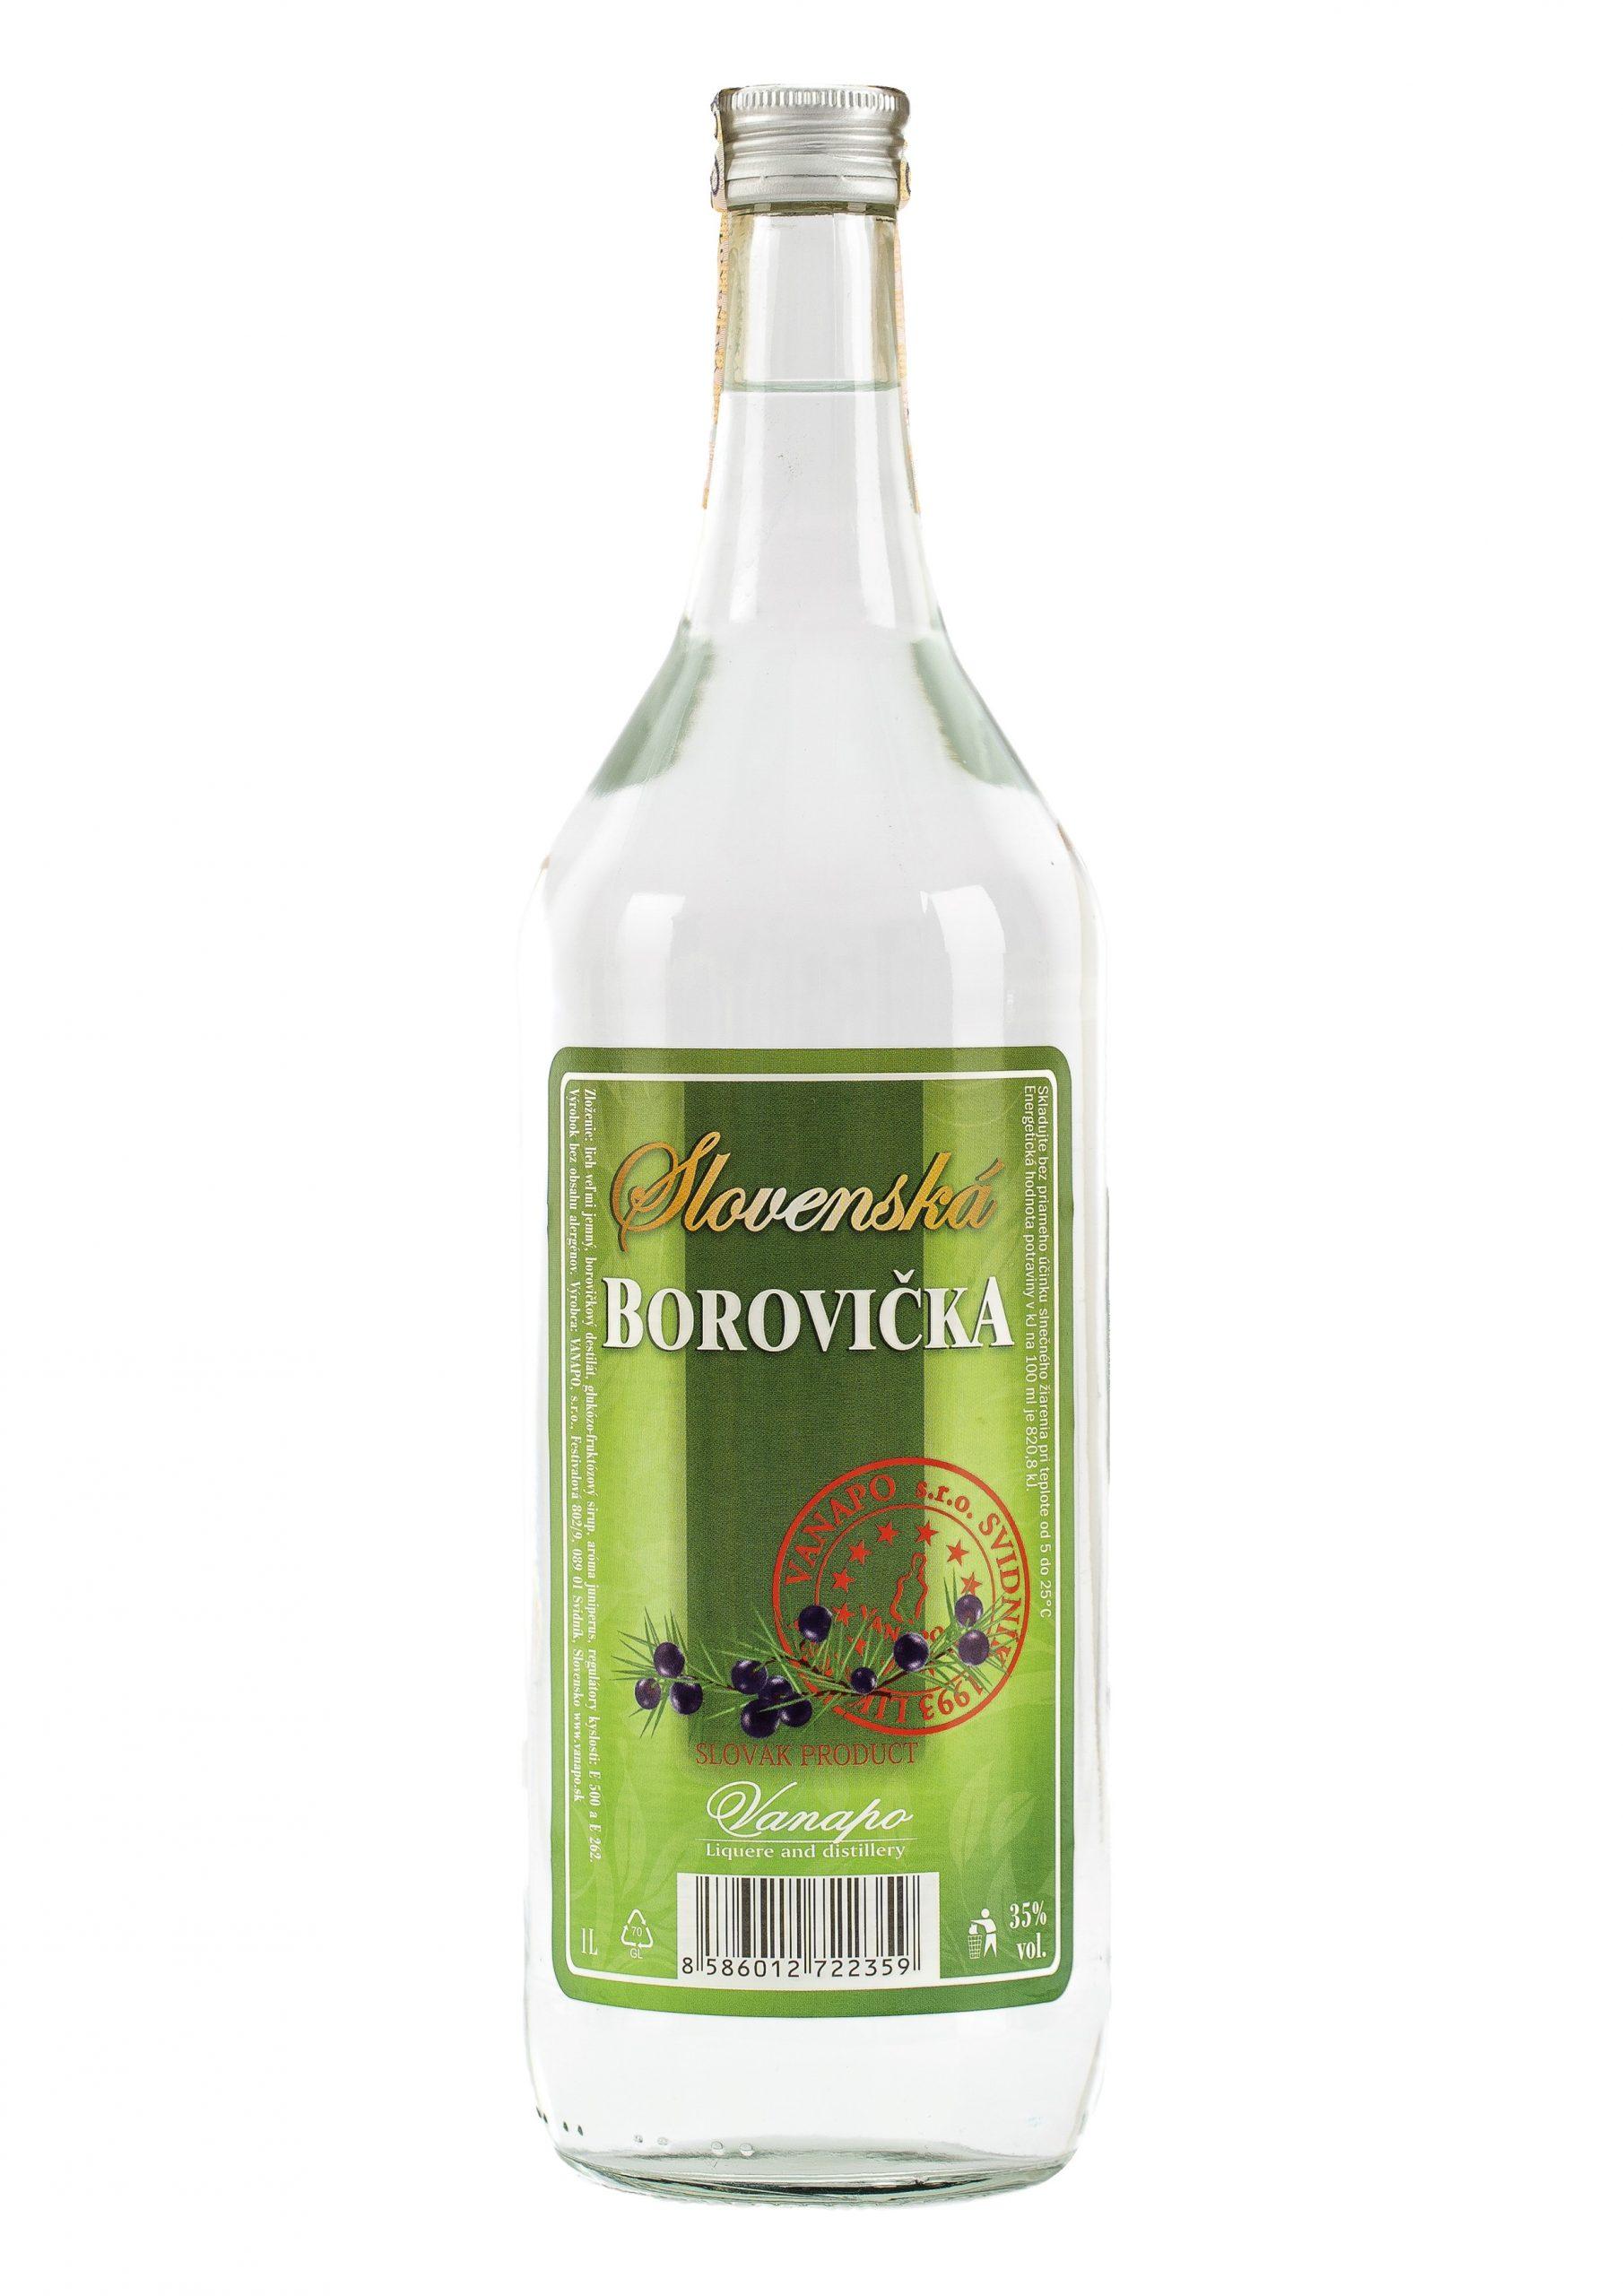 Borovicka Slovenska 35 1L scaled 1 - Slovenská borovička